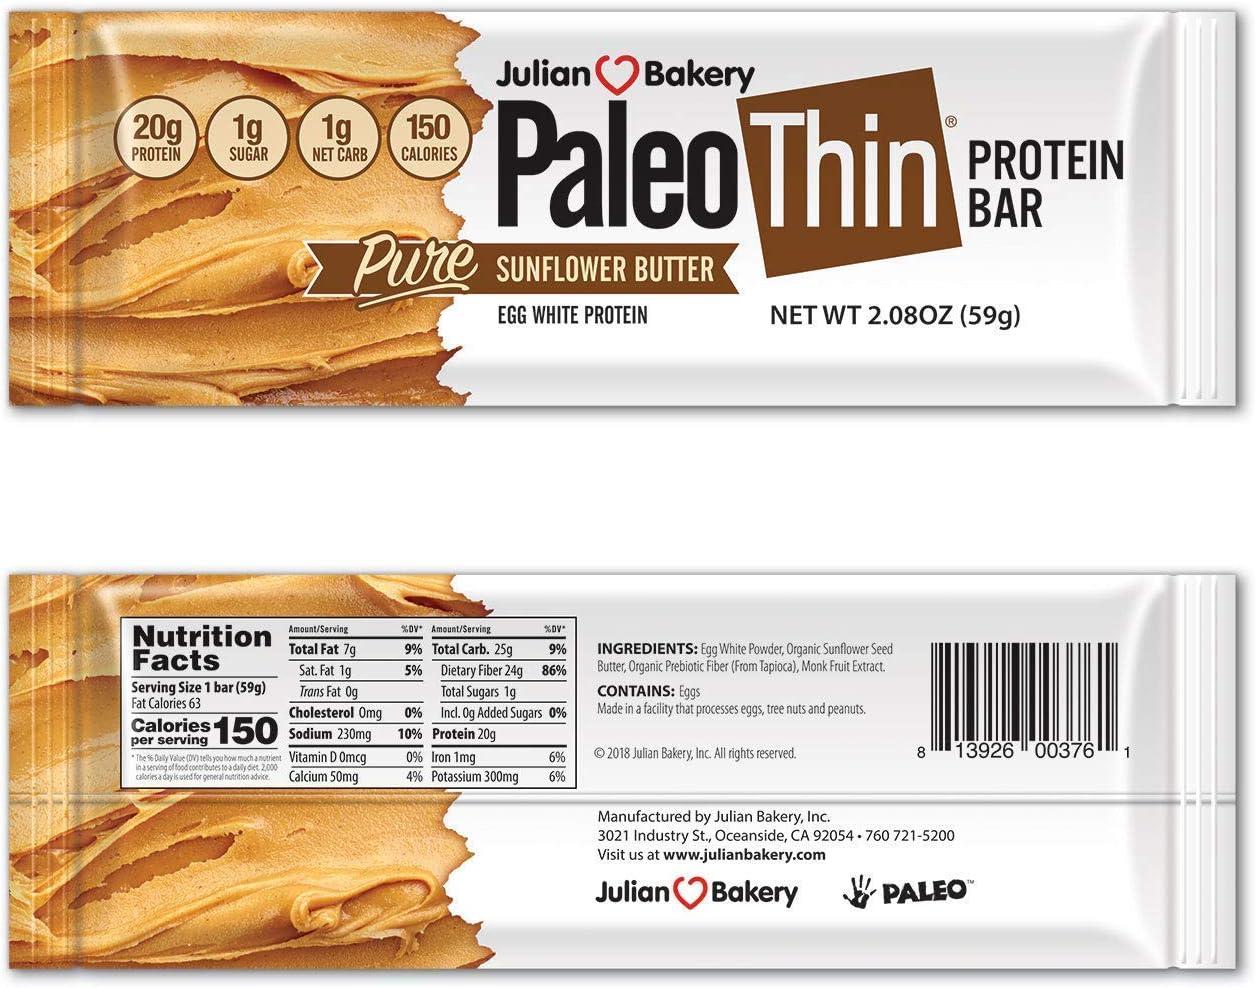 Julian Bakery Paleo Thin Protein Bar | Sunflower Butter | Egg White Protein | 20g Protein | 1 Net Carb | 12 Bars